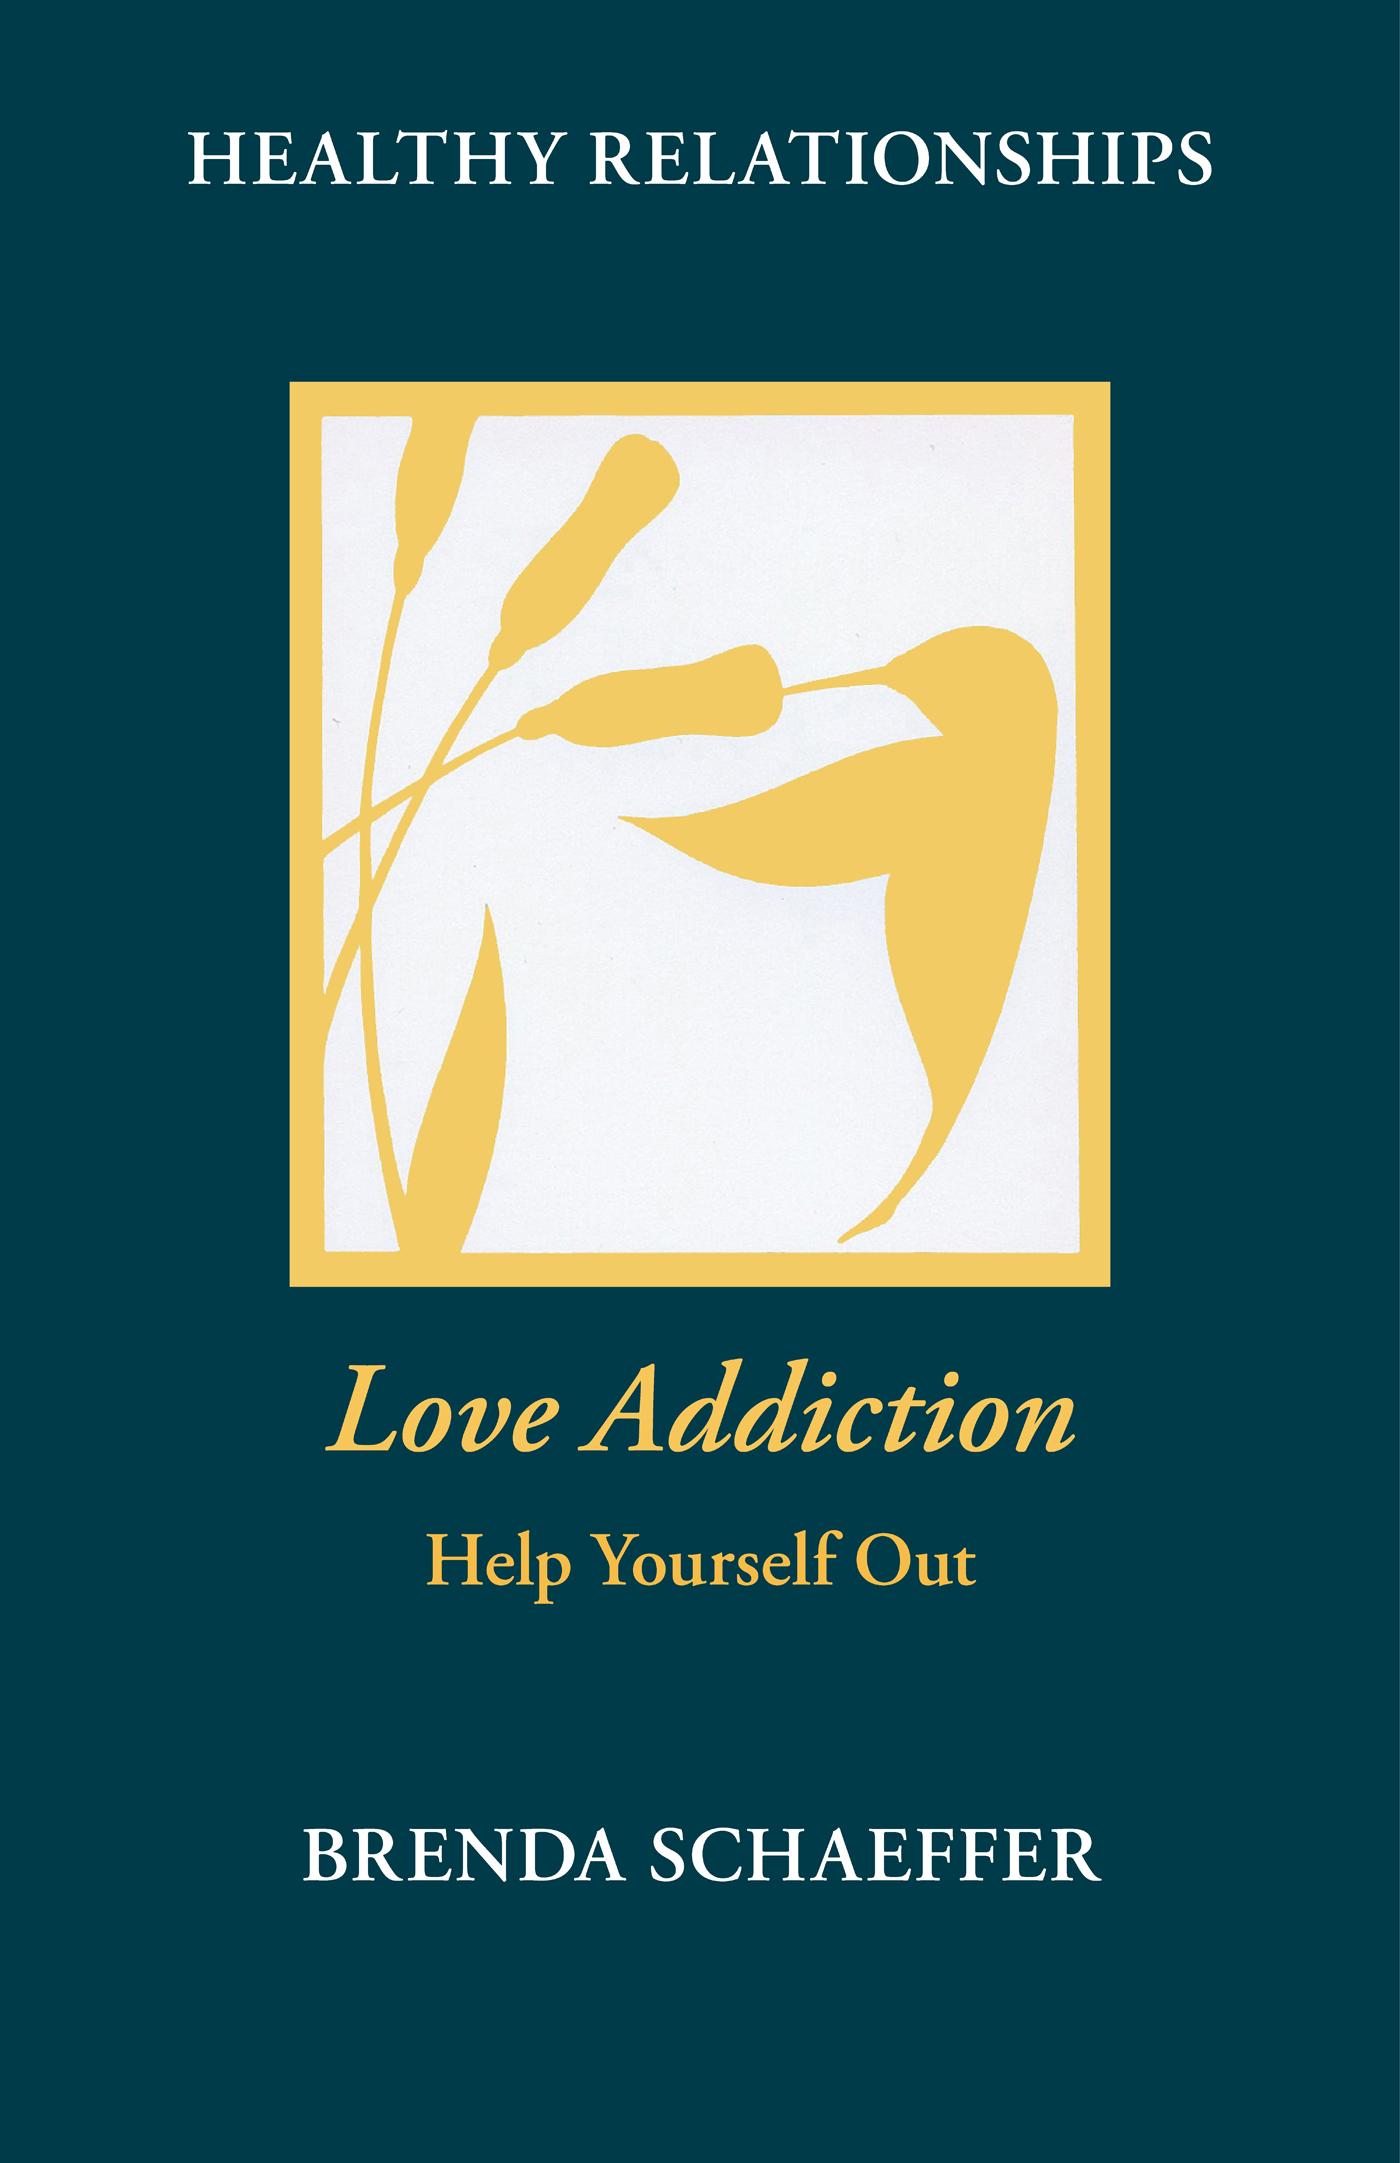 Love addiction cover.jpg